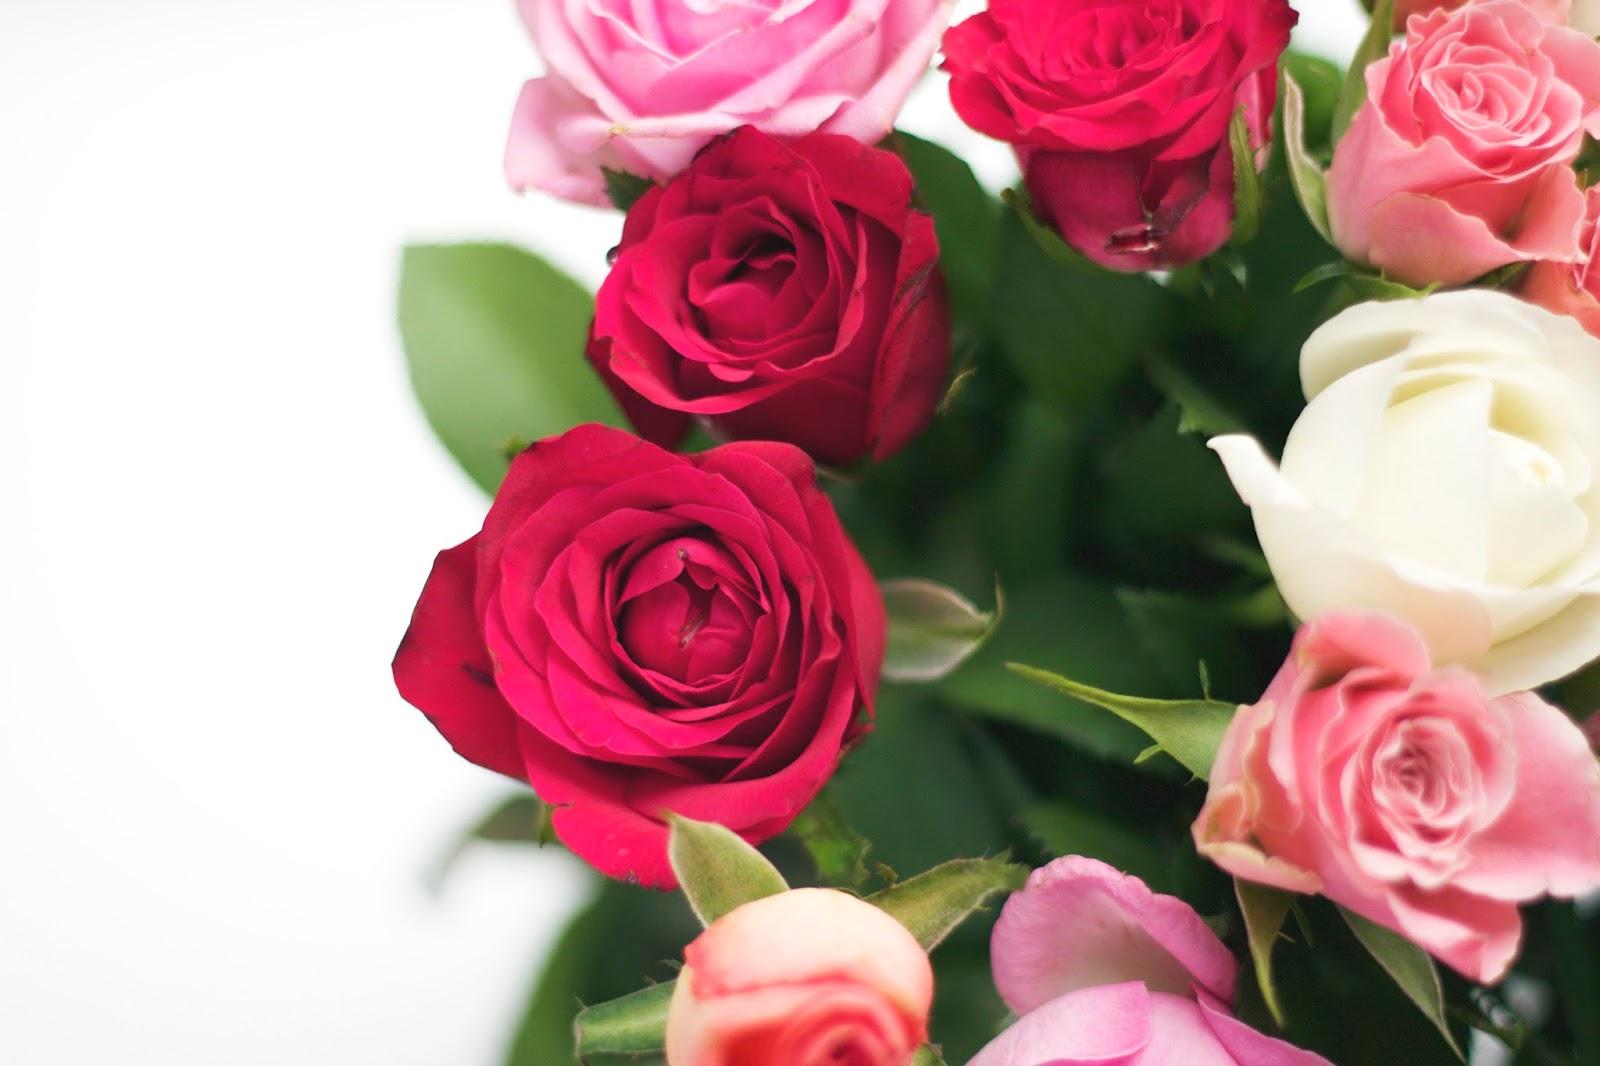 Rose, Roses, Flowers, Beauty Blog Flowers, Photography, 50mm Lens, Beauty blog, BBloggers, Derbyshire, Belper, Bloom, Beauty,